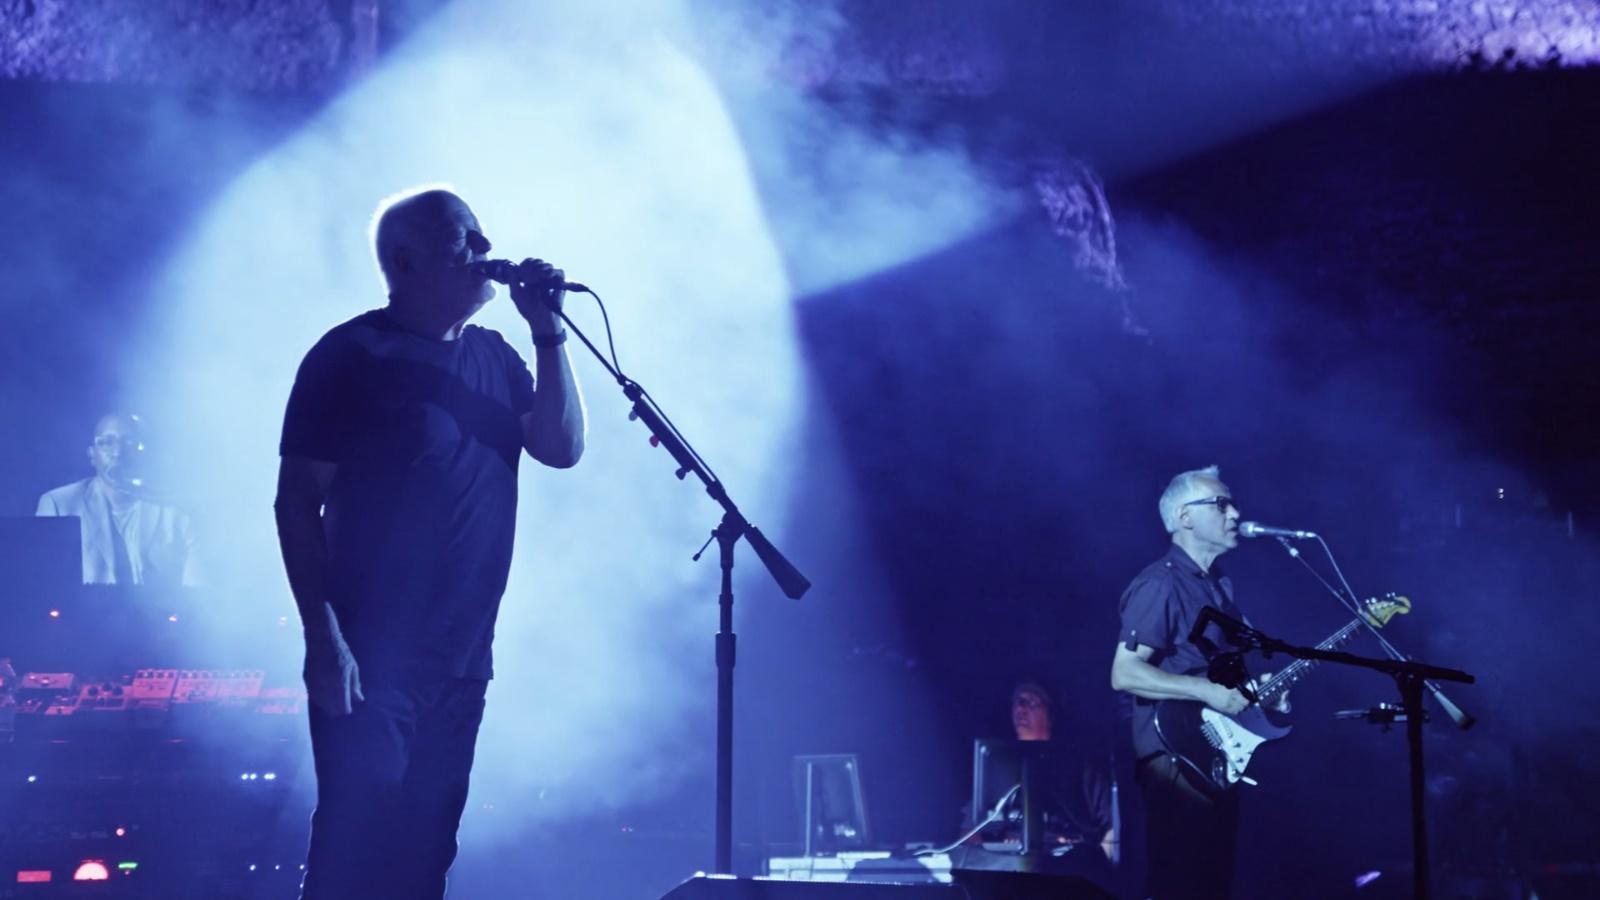 David gilmour tour uk 2017 for Pink floyd gira 2017